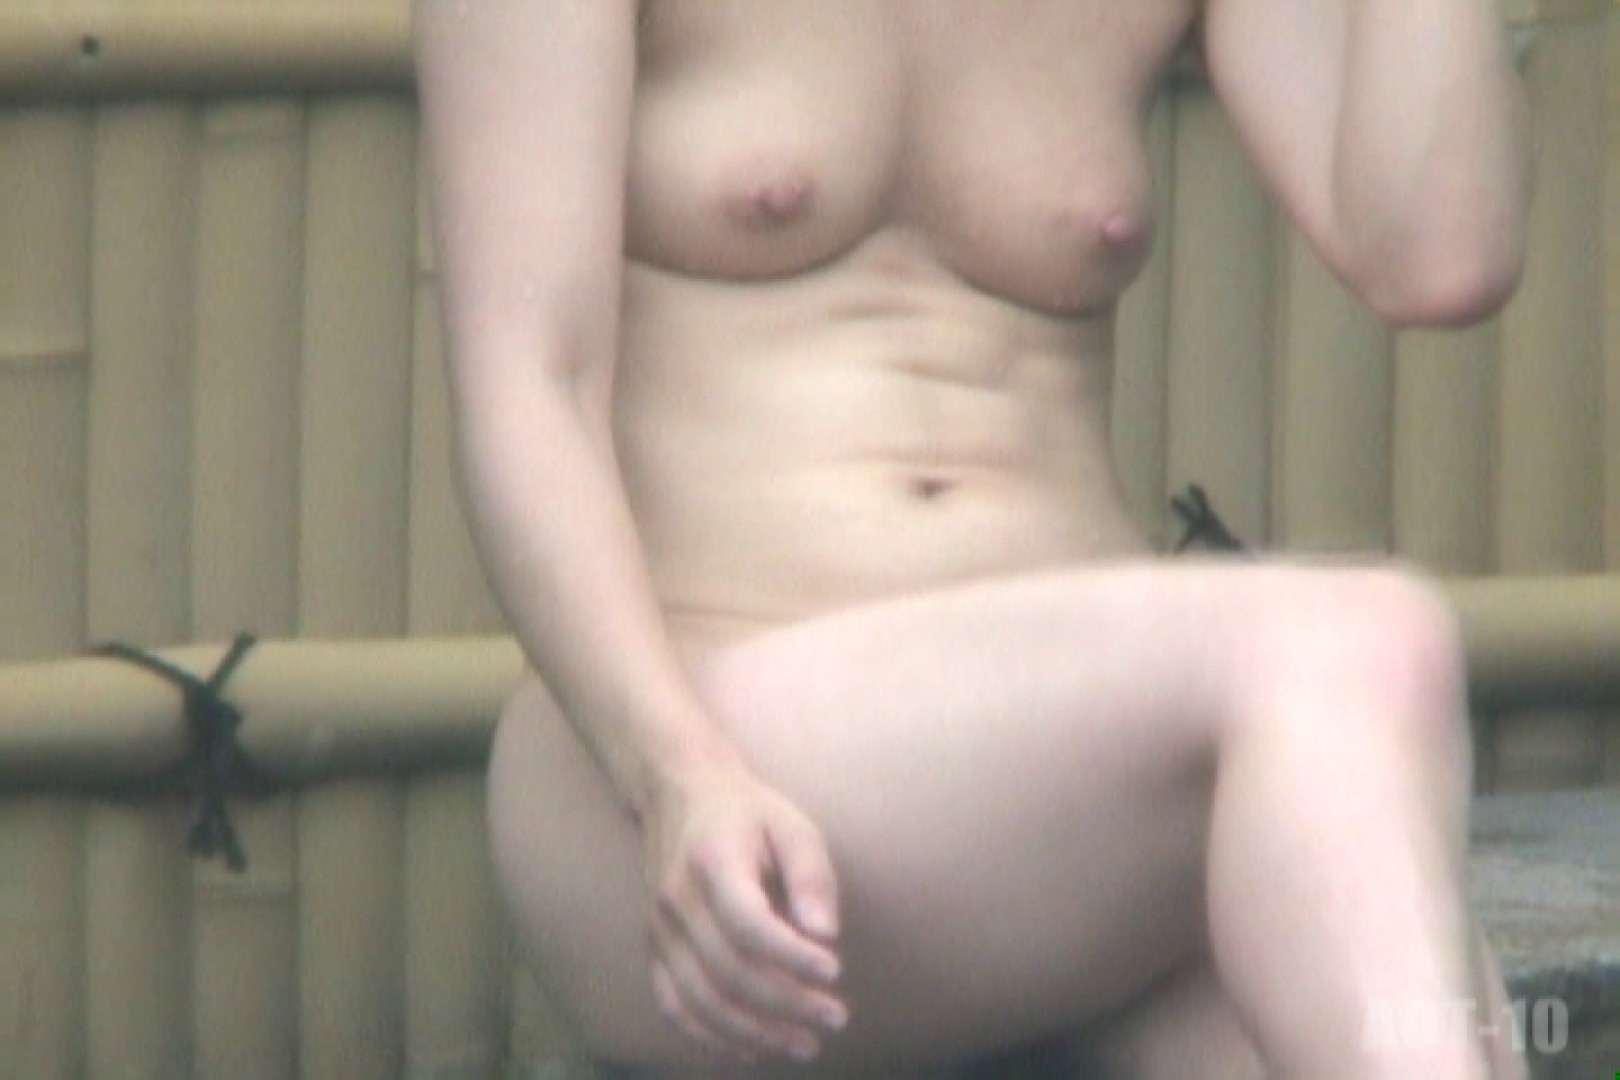 Aquaな露天風呂Vol.795 盗撮師作品 おめこ無修正動画無料 103pic 86